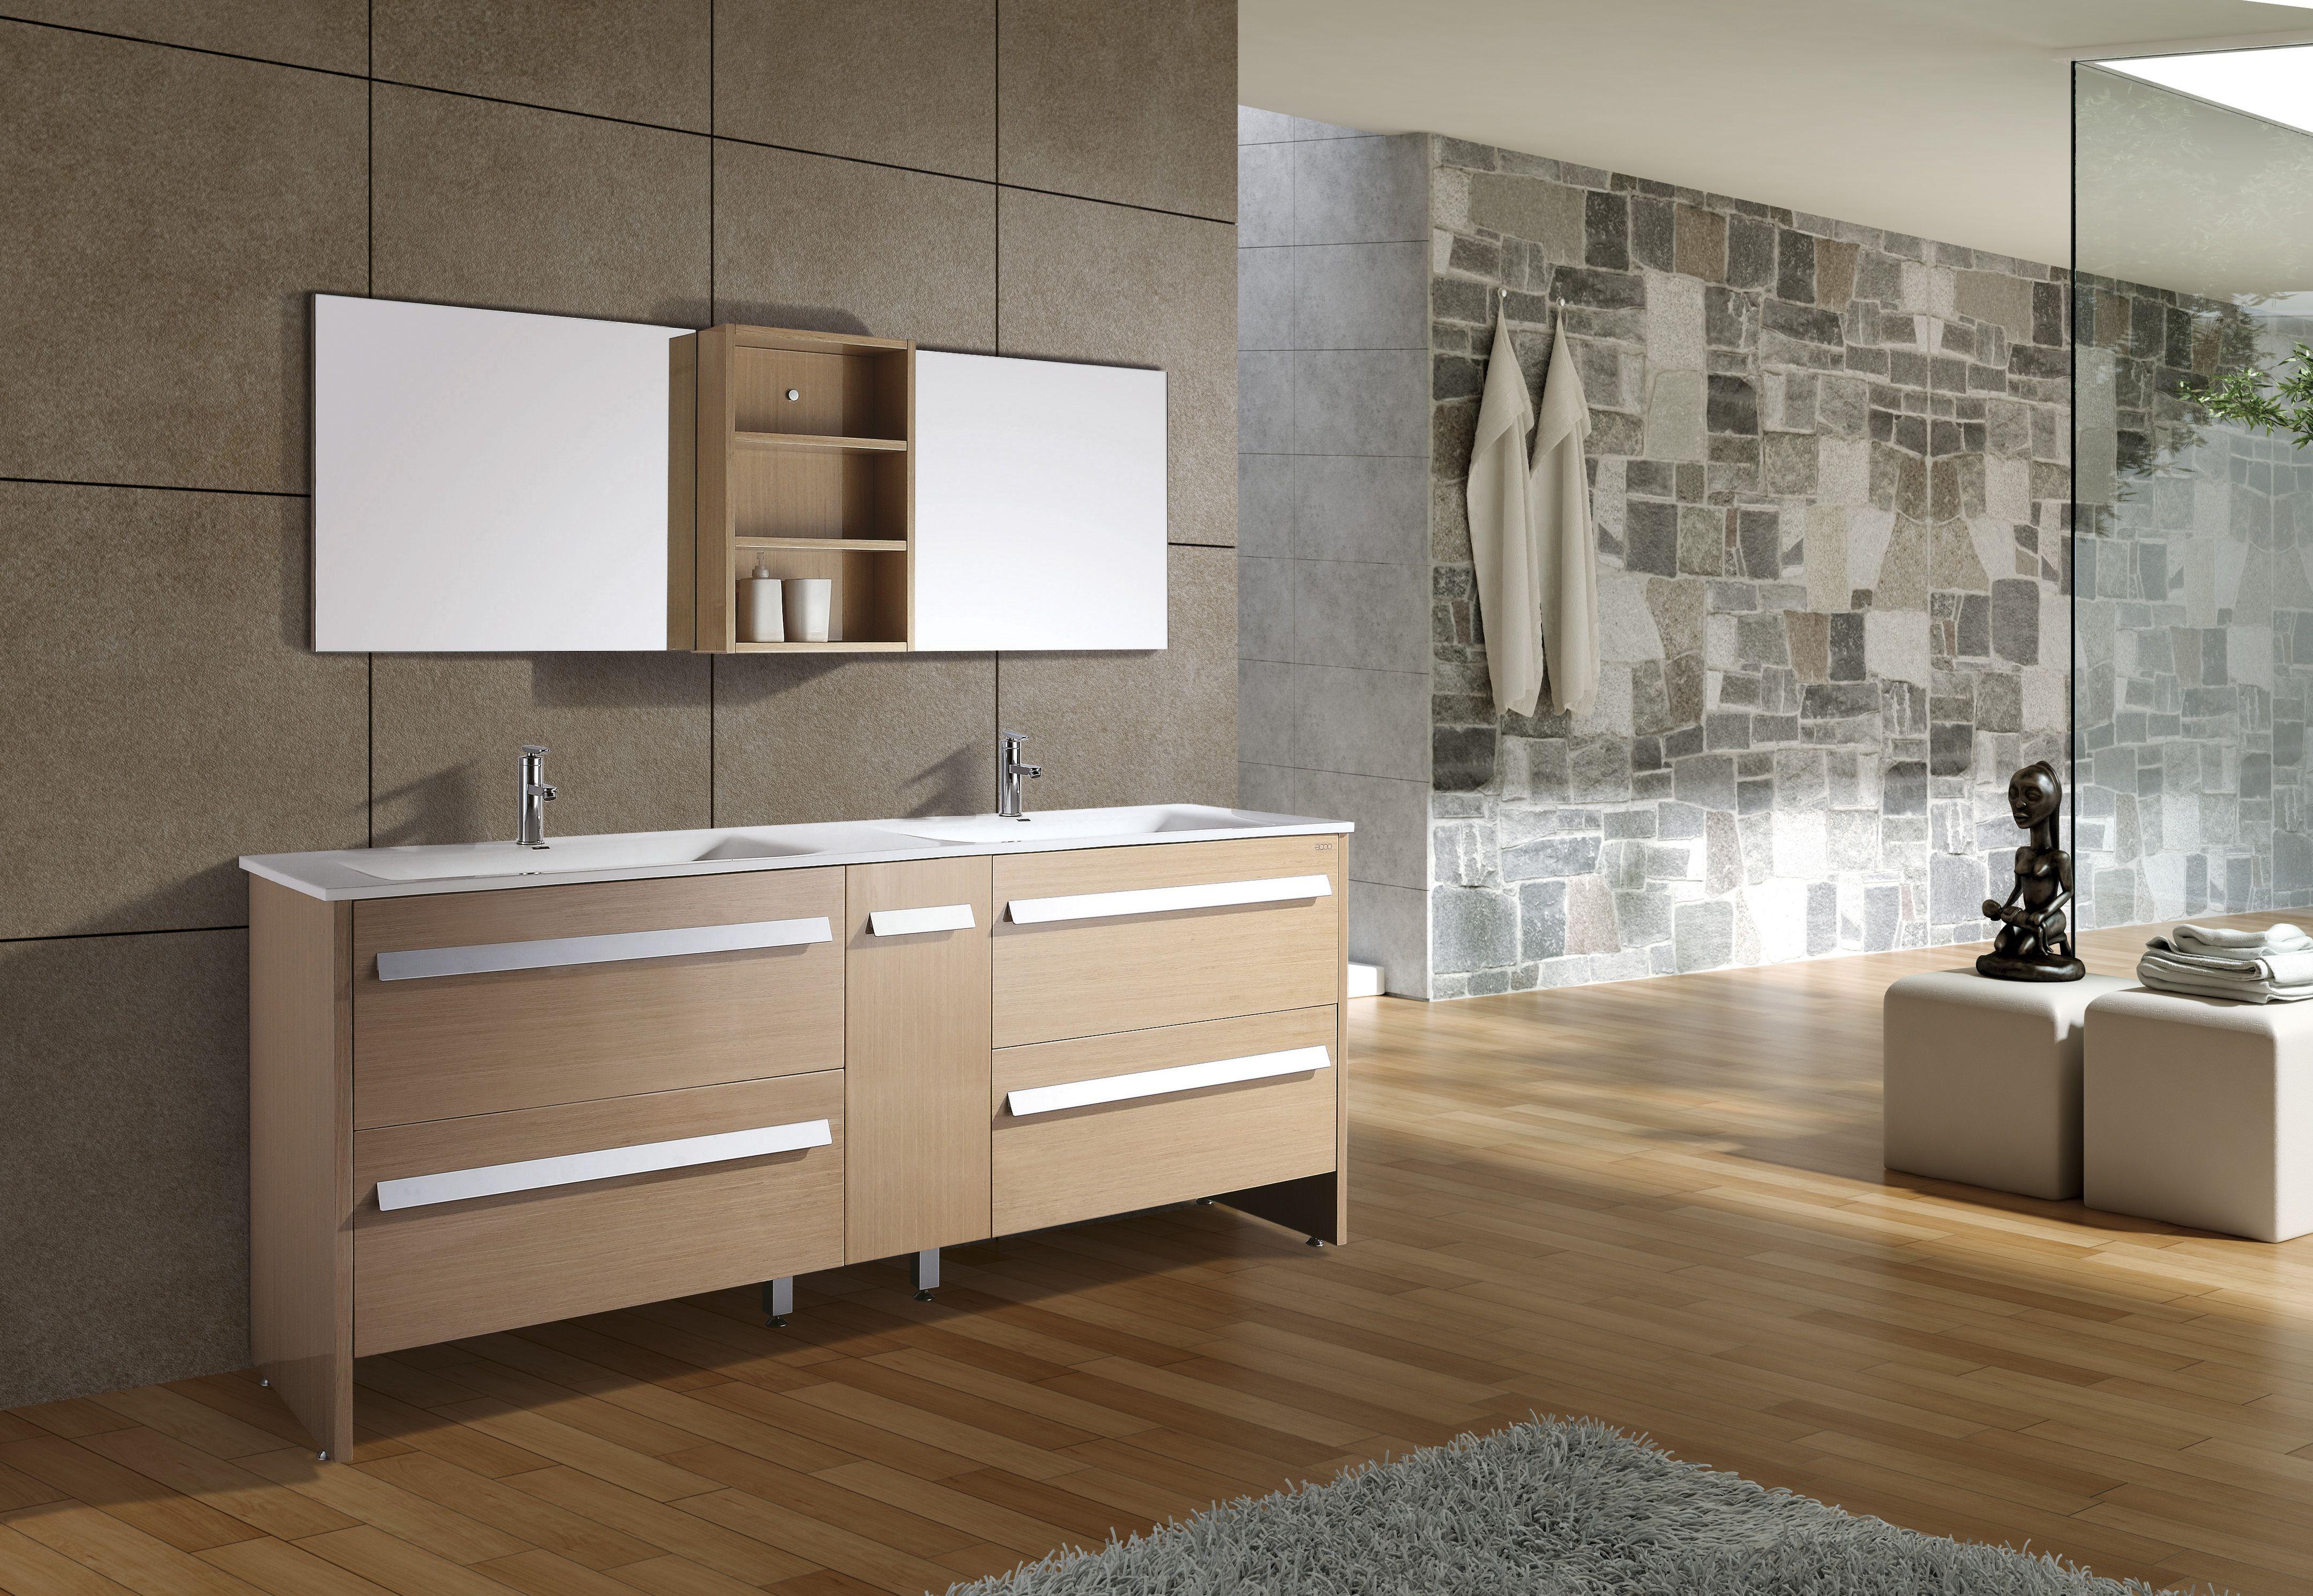 Bathroom rug and modern double sink bathroom design bathroom